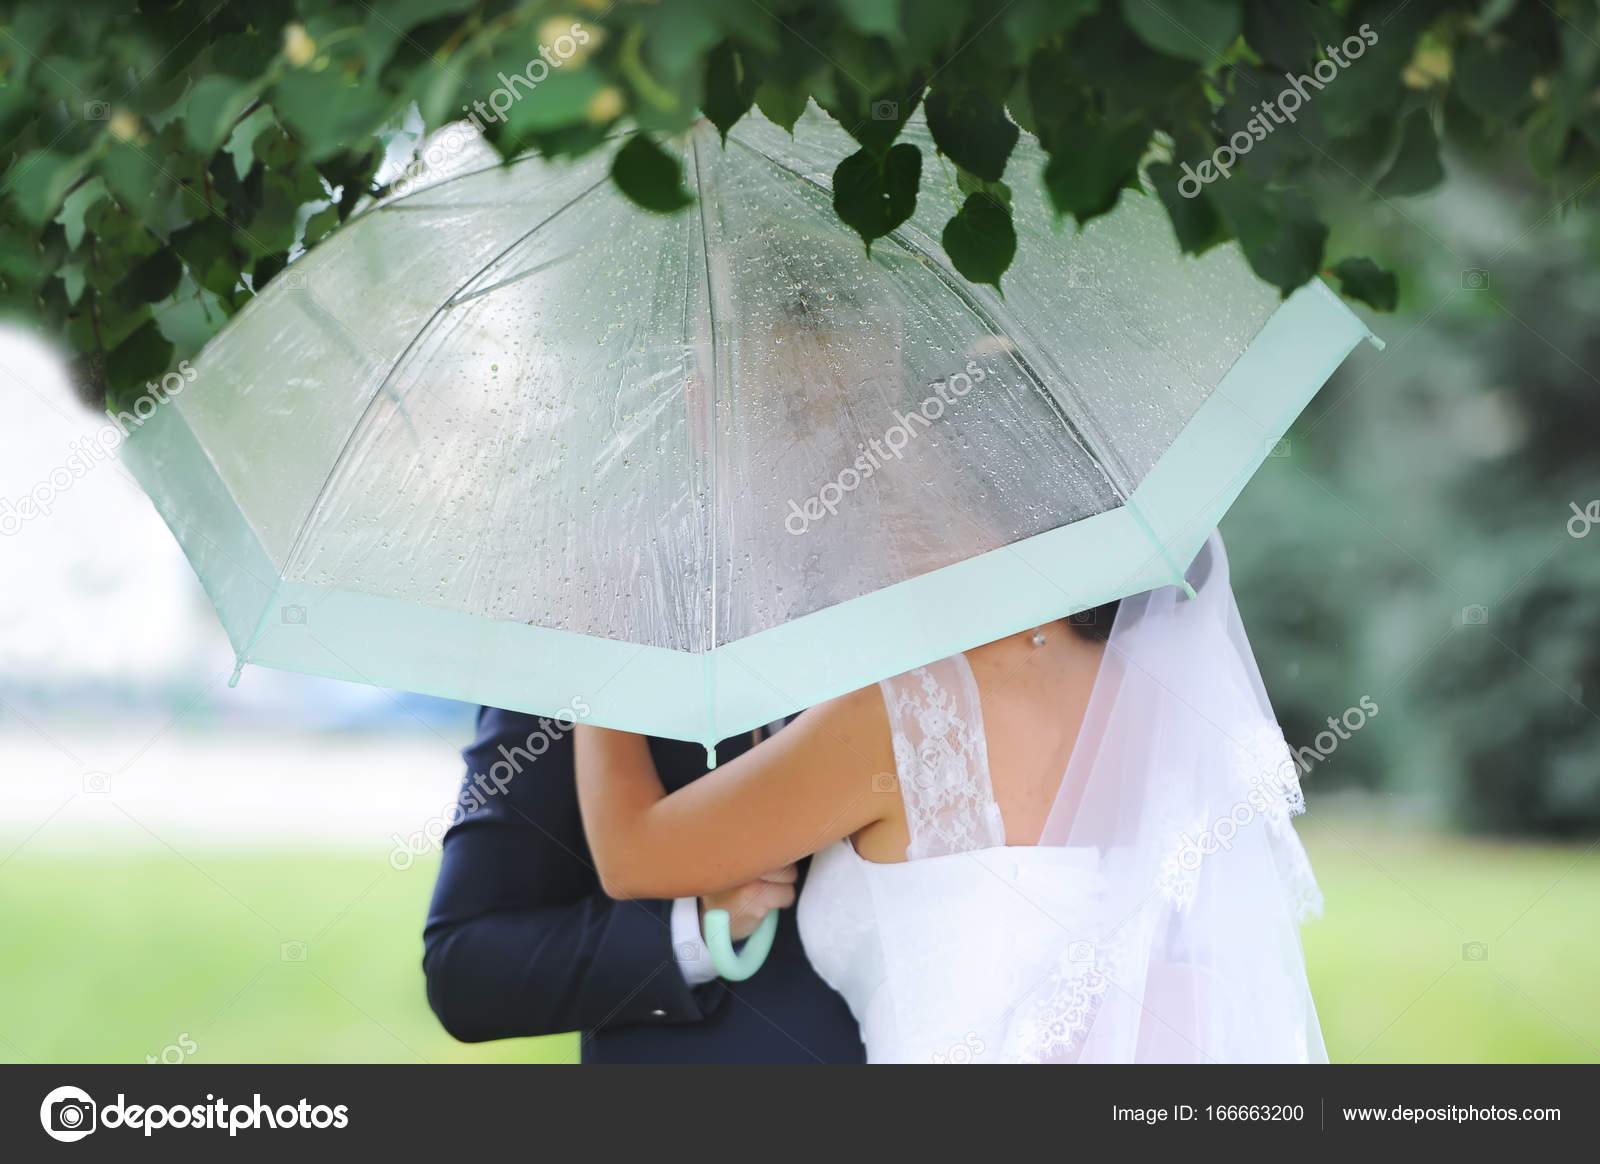 Romantic Beautiful Wedding Couple Hugging Under Elegant Umbrella Stock Photo C Avk78 166663200